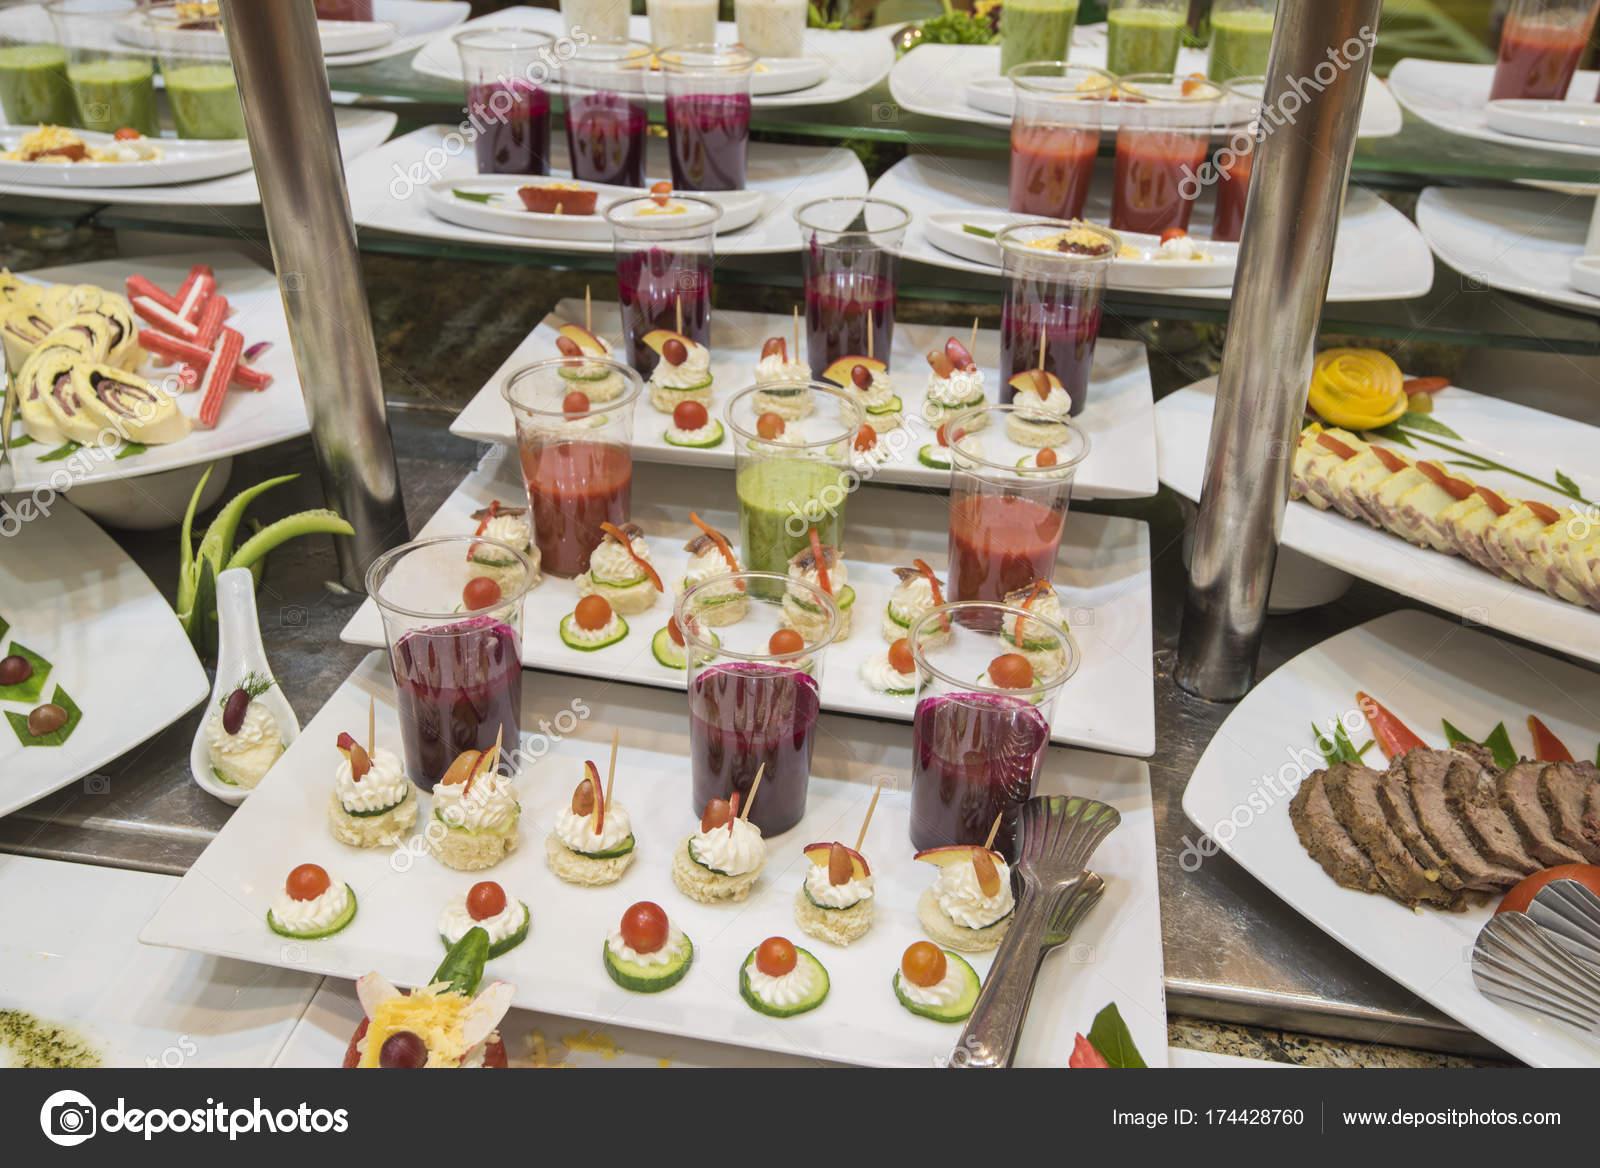 Buffet Di Insalate Miste : Ottima selezione di cibo di insalata al ristorante a buffet u foto